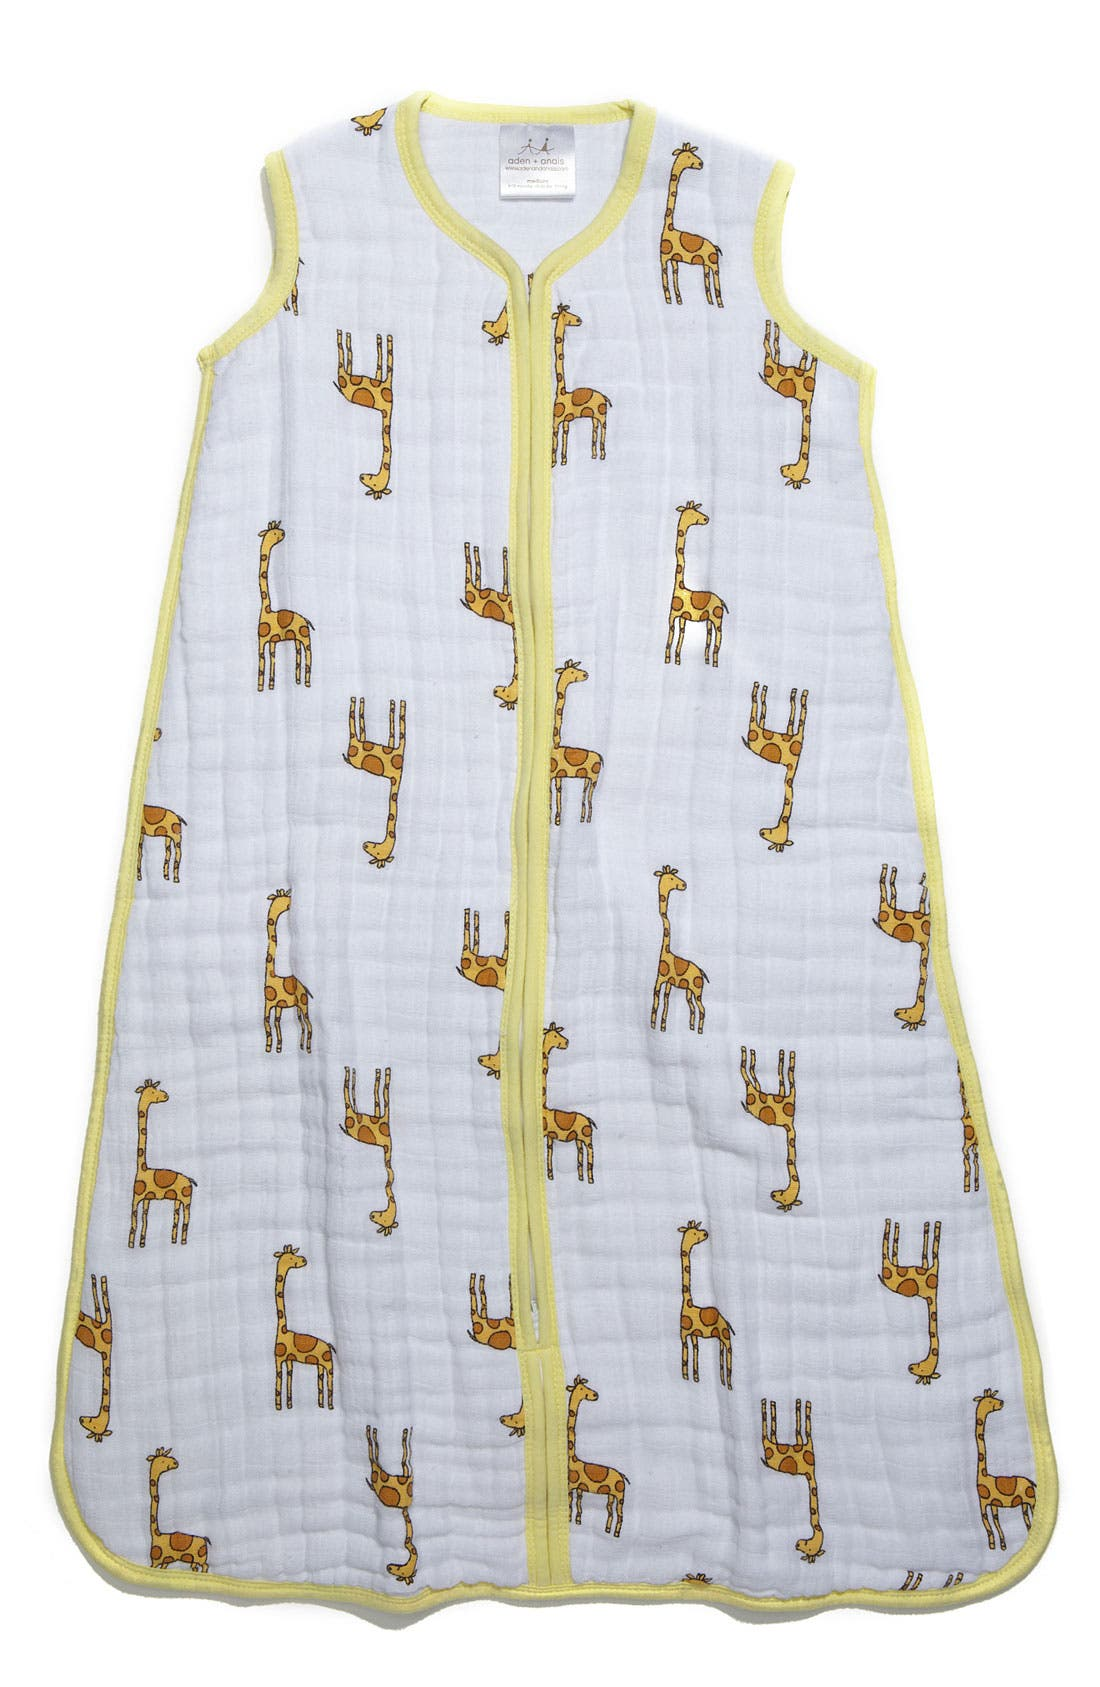 Alternate Image 1 Selected - aden + anais 'Cozy Sleeping Bag' Wearable Blanket (Baby)